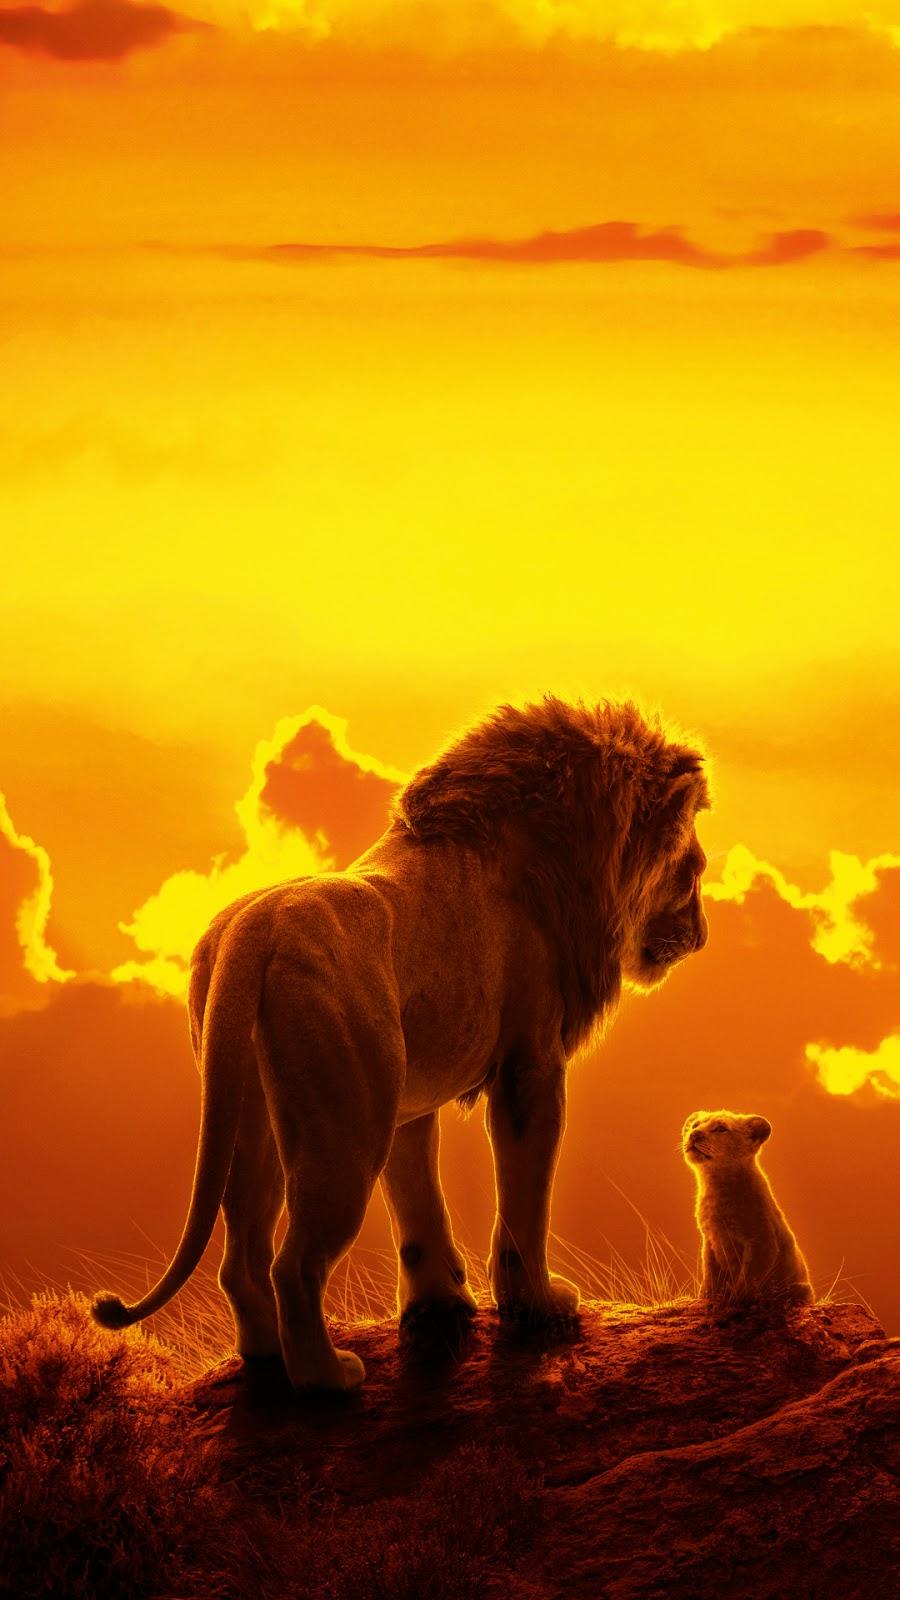 The Lion King 2019 Mobile Wallpaper - HD Mobile Walls